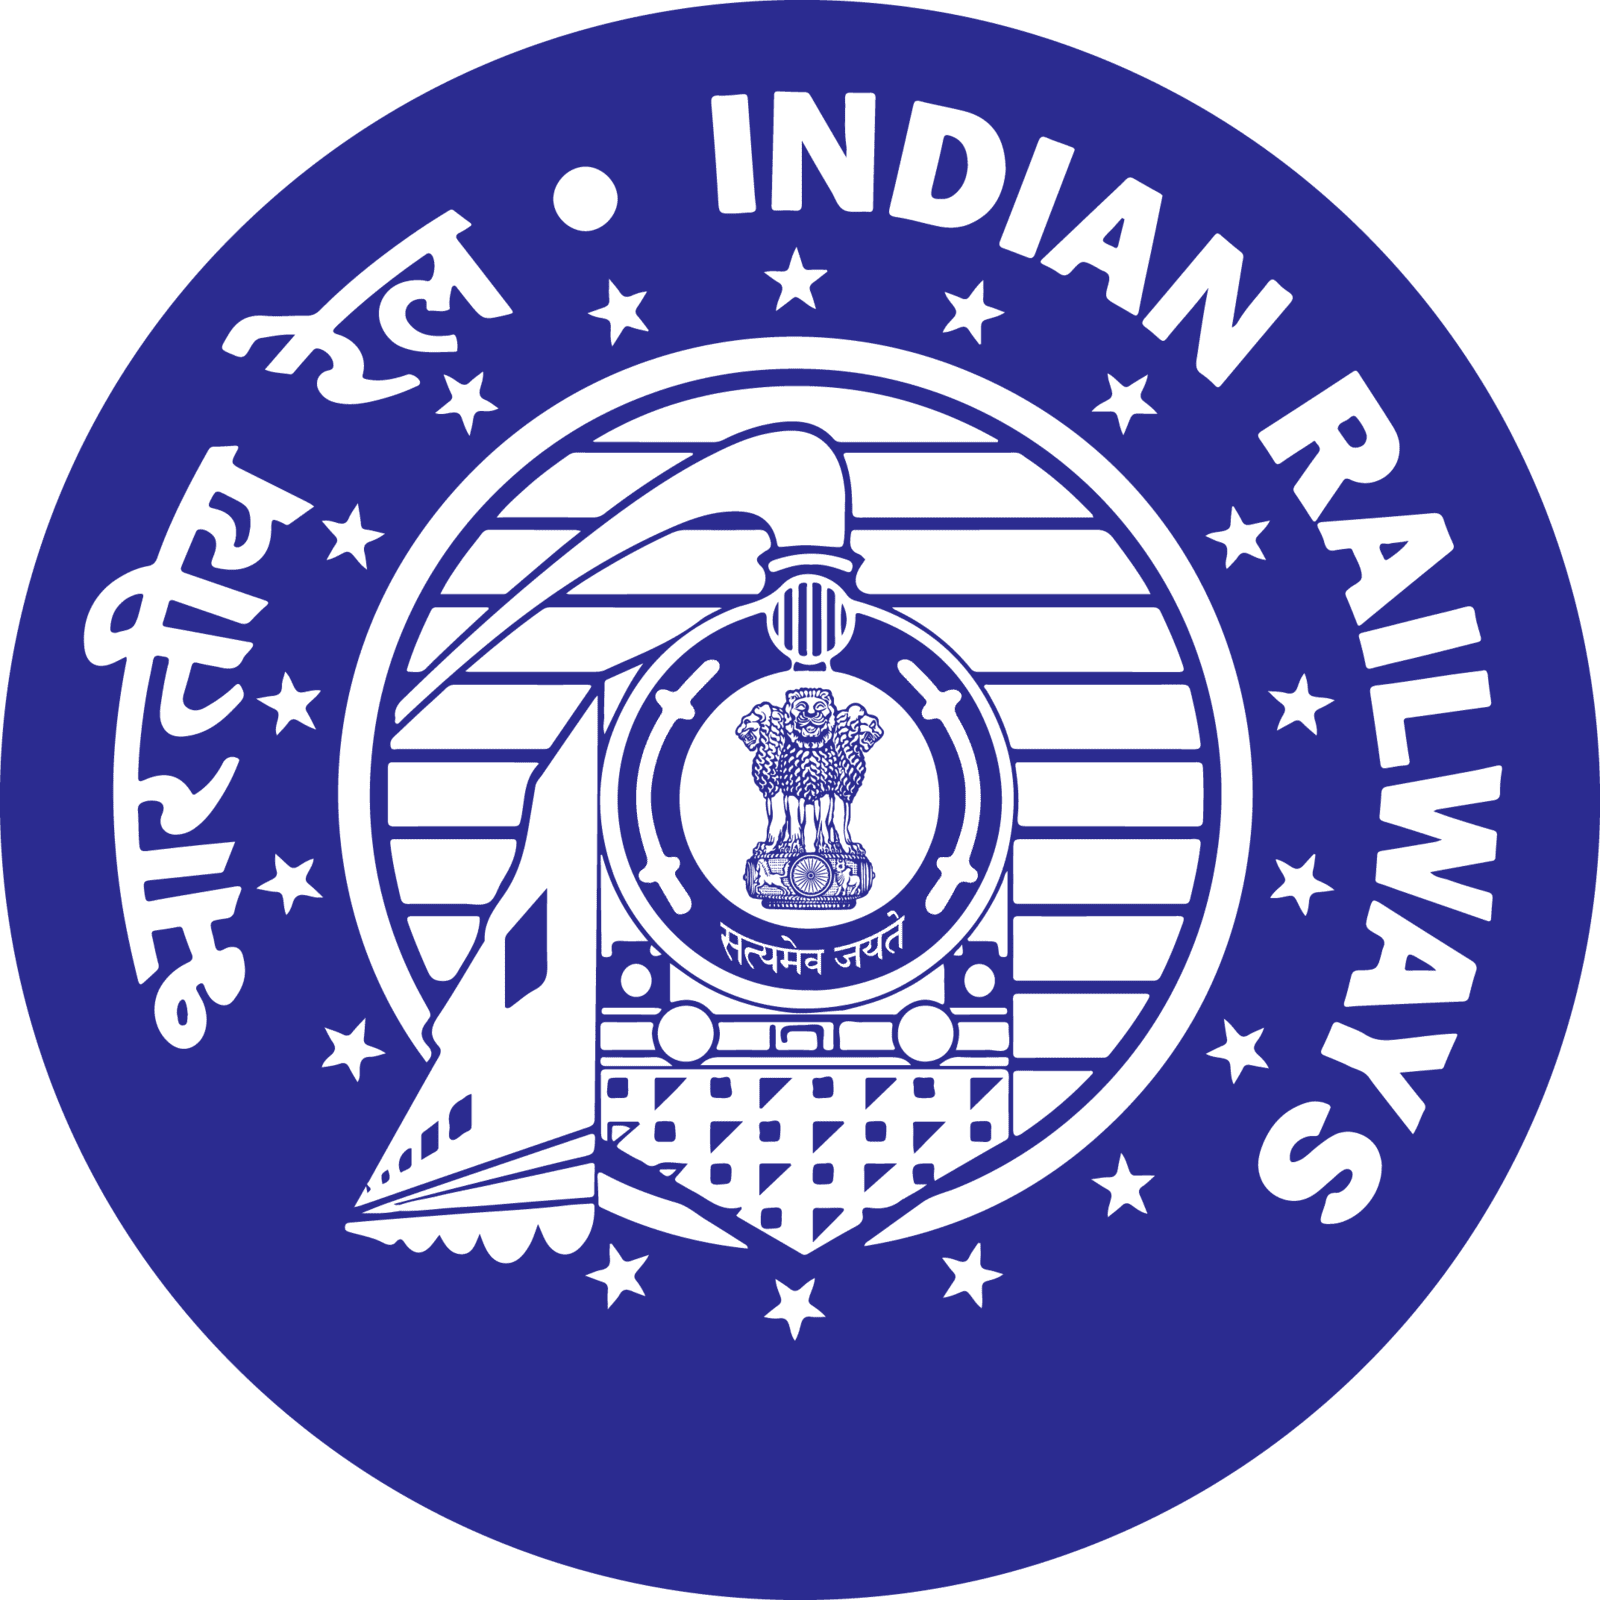 Bank of Baroda - gandhi nagar